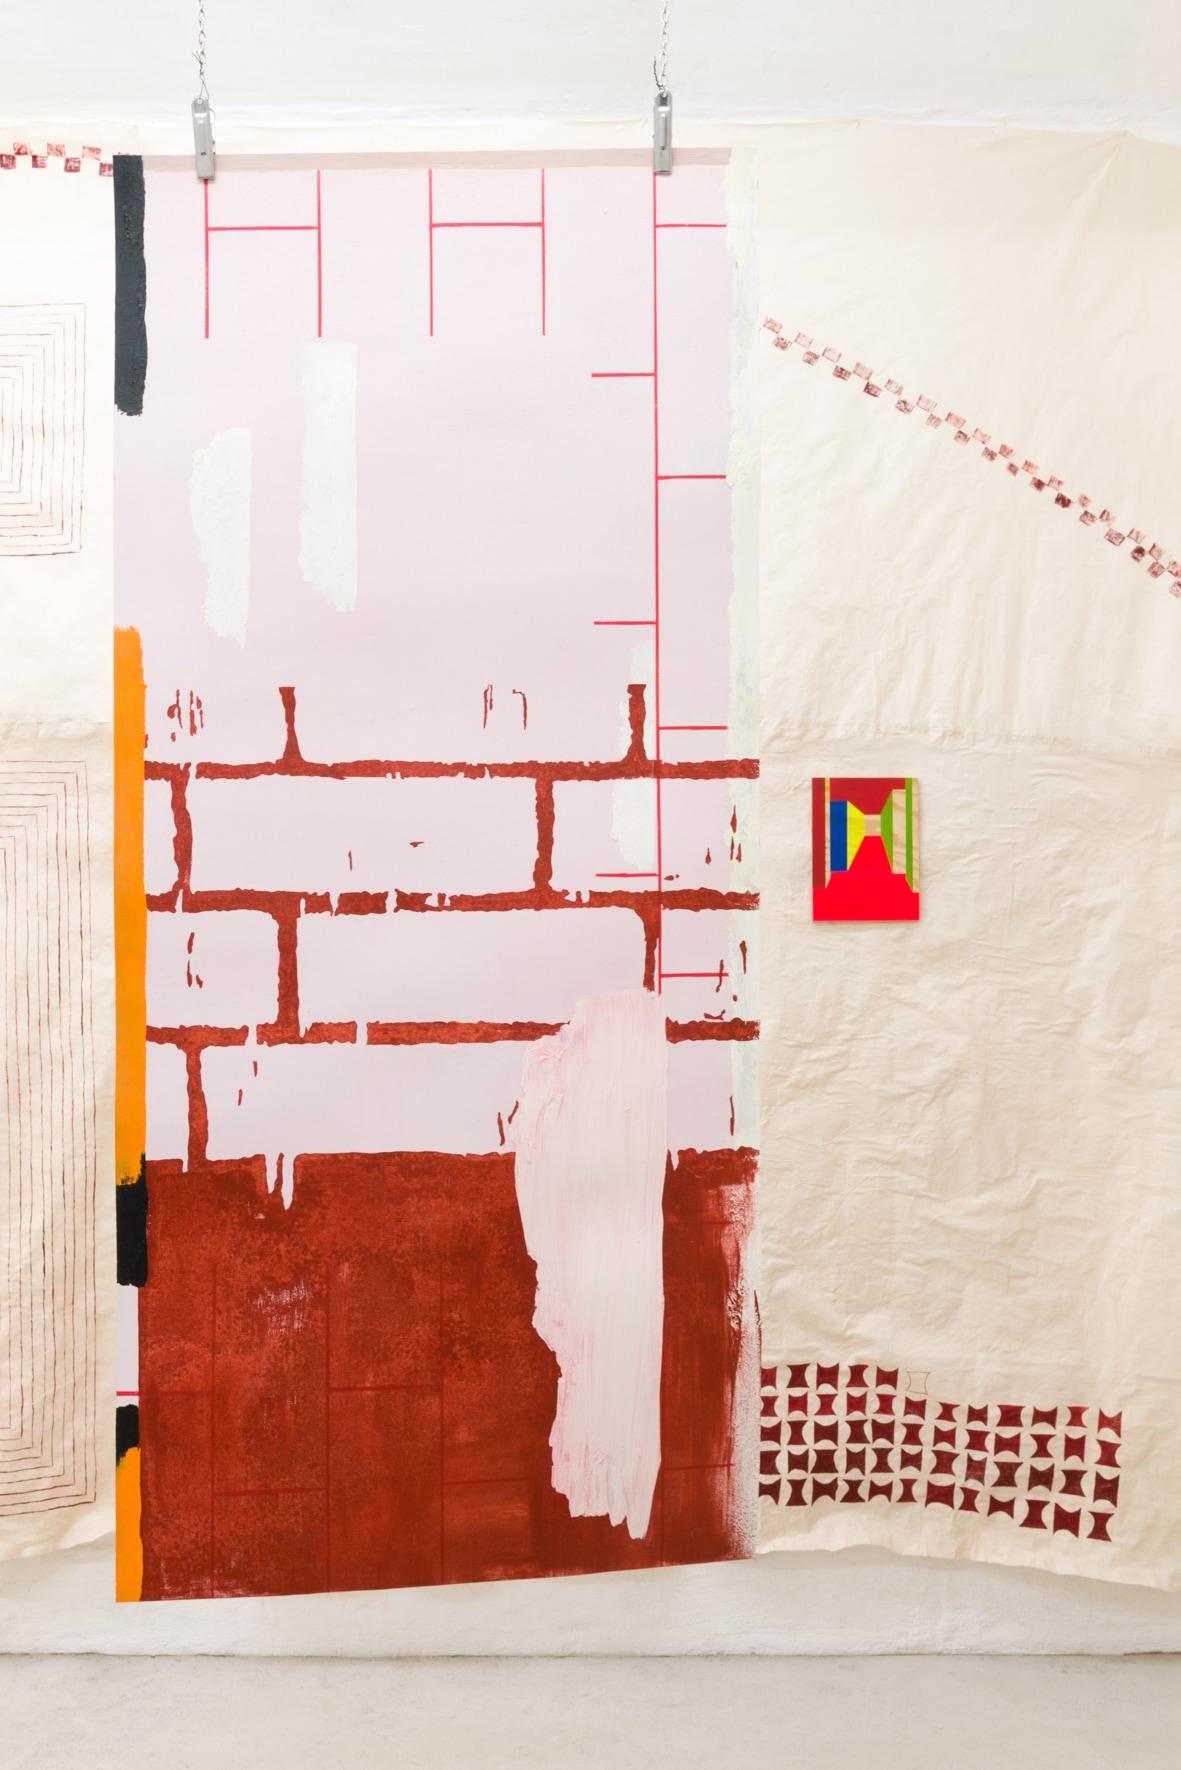 Sonia Almeida, Liminal score, 2021 Oil paint on wood veneer, 117 x 51 cm